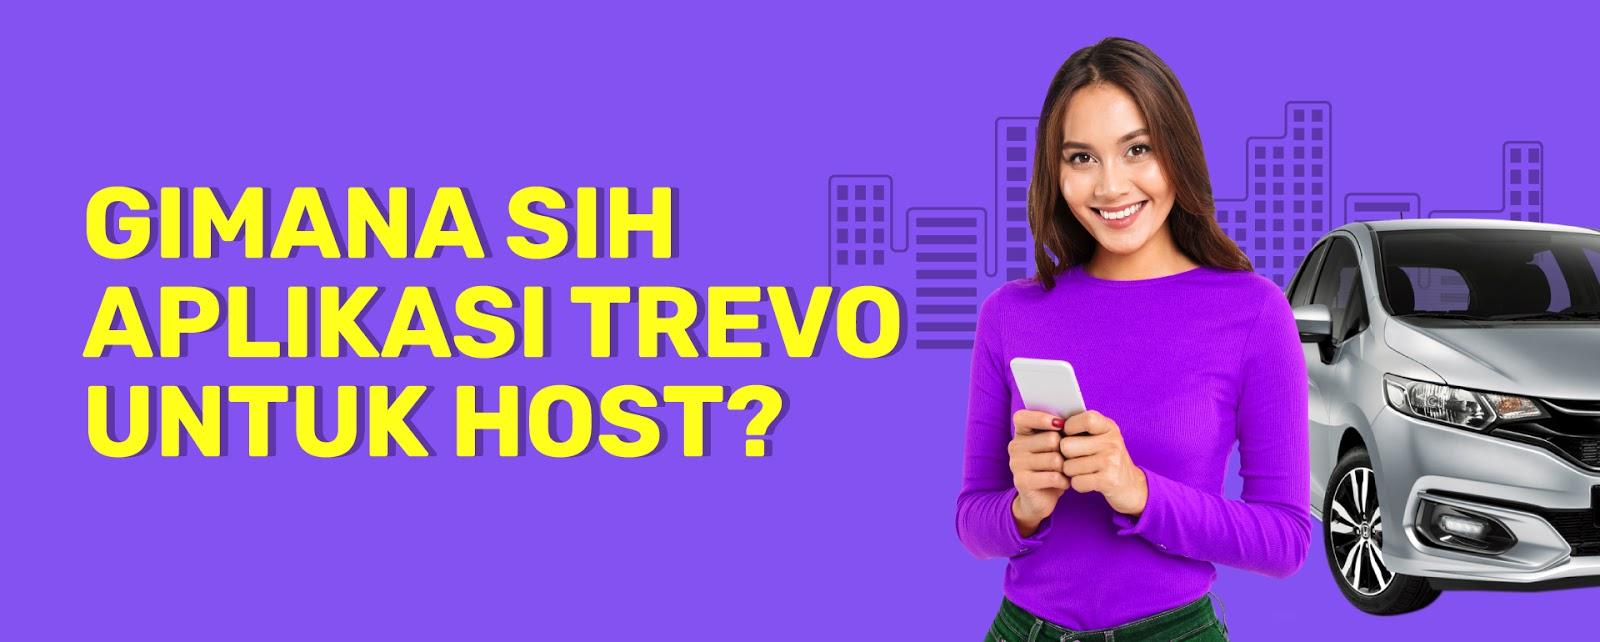 Sewa Mobil Murah Hanya 199 Ribu! - TREVO Stories ID